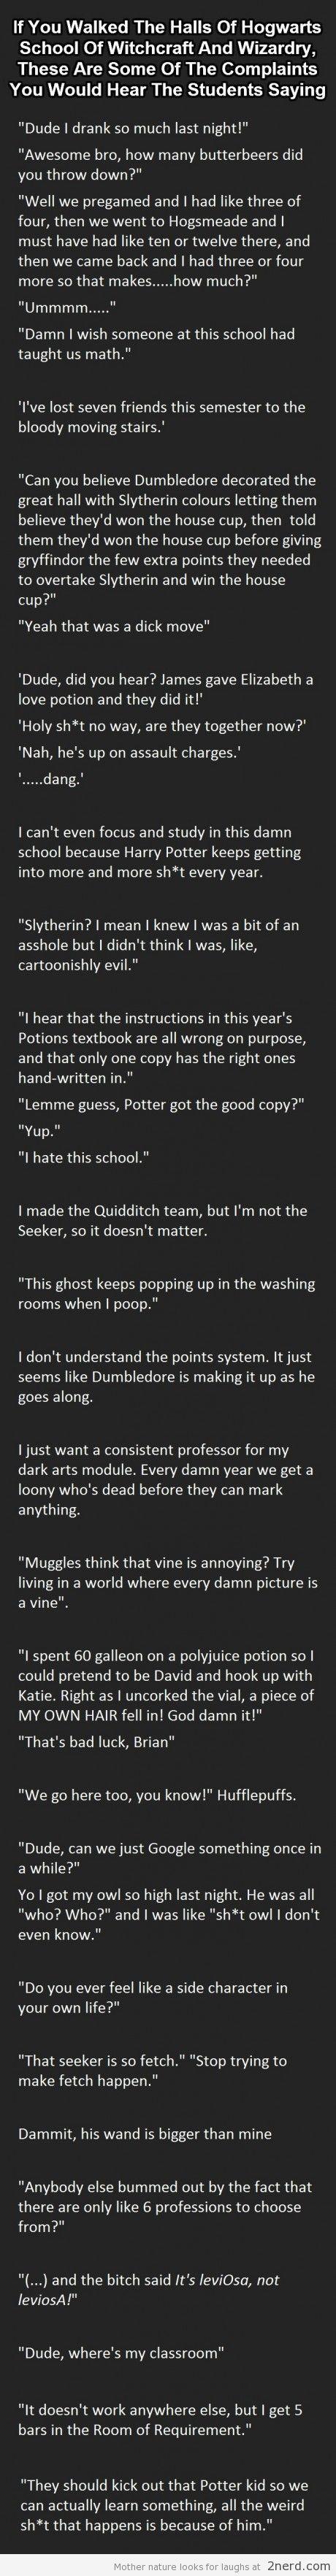 If you walked the halls of Hogwarts - http://2nerd.com/funny-pics/walked-halls-hogwarts/